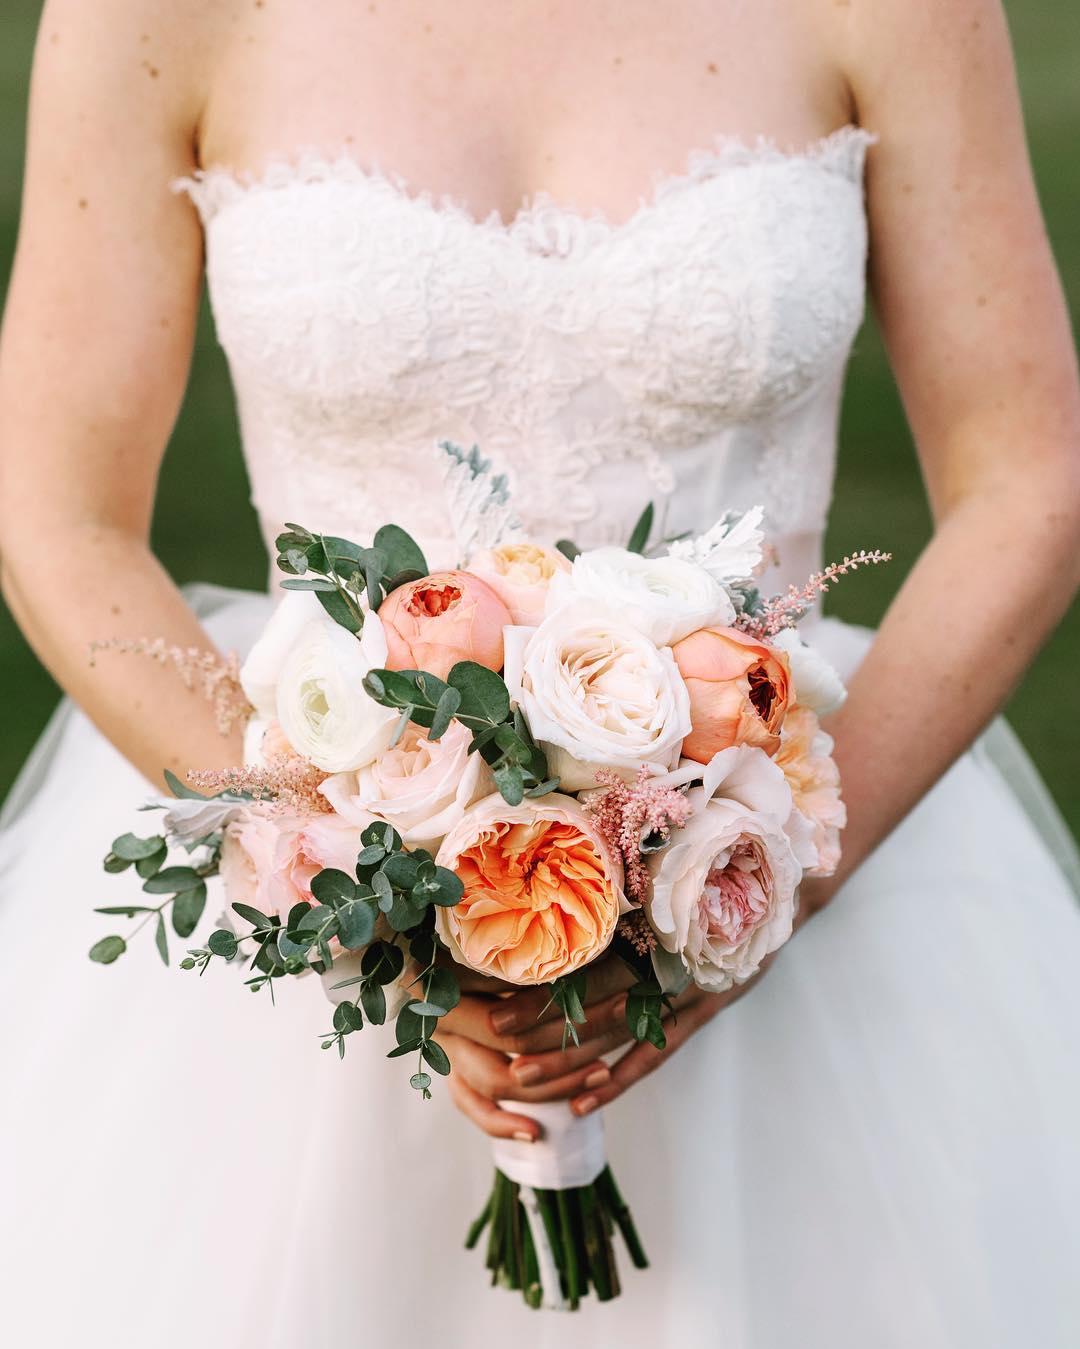 {love} photo | @jennidarling  #thebride #bouquet #prettyflowers #simple #romantic #weddingflowers  #gardenroses #eucalyptus #weddingflorist #lotusfloraldesigns